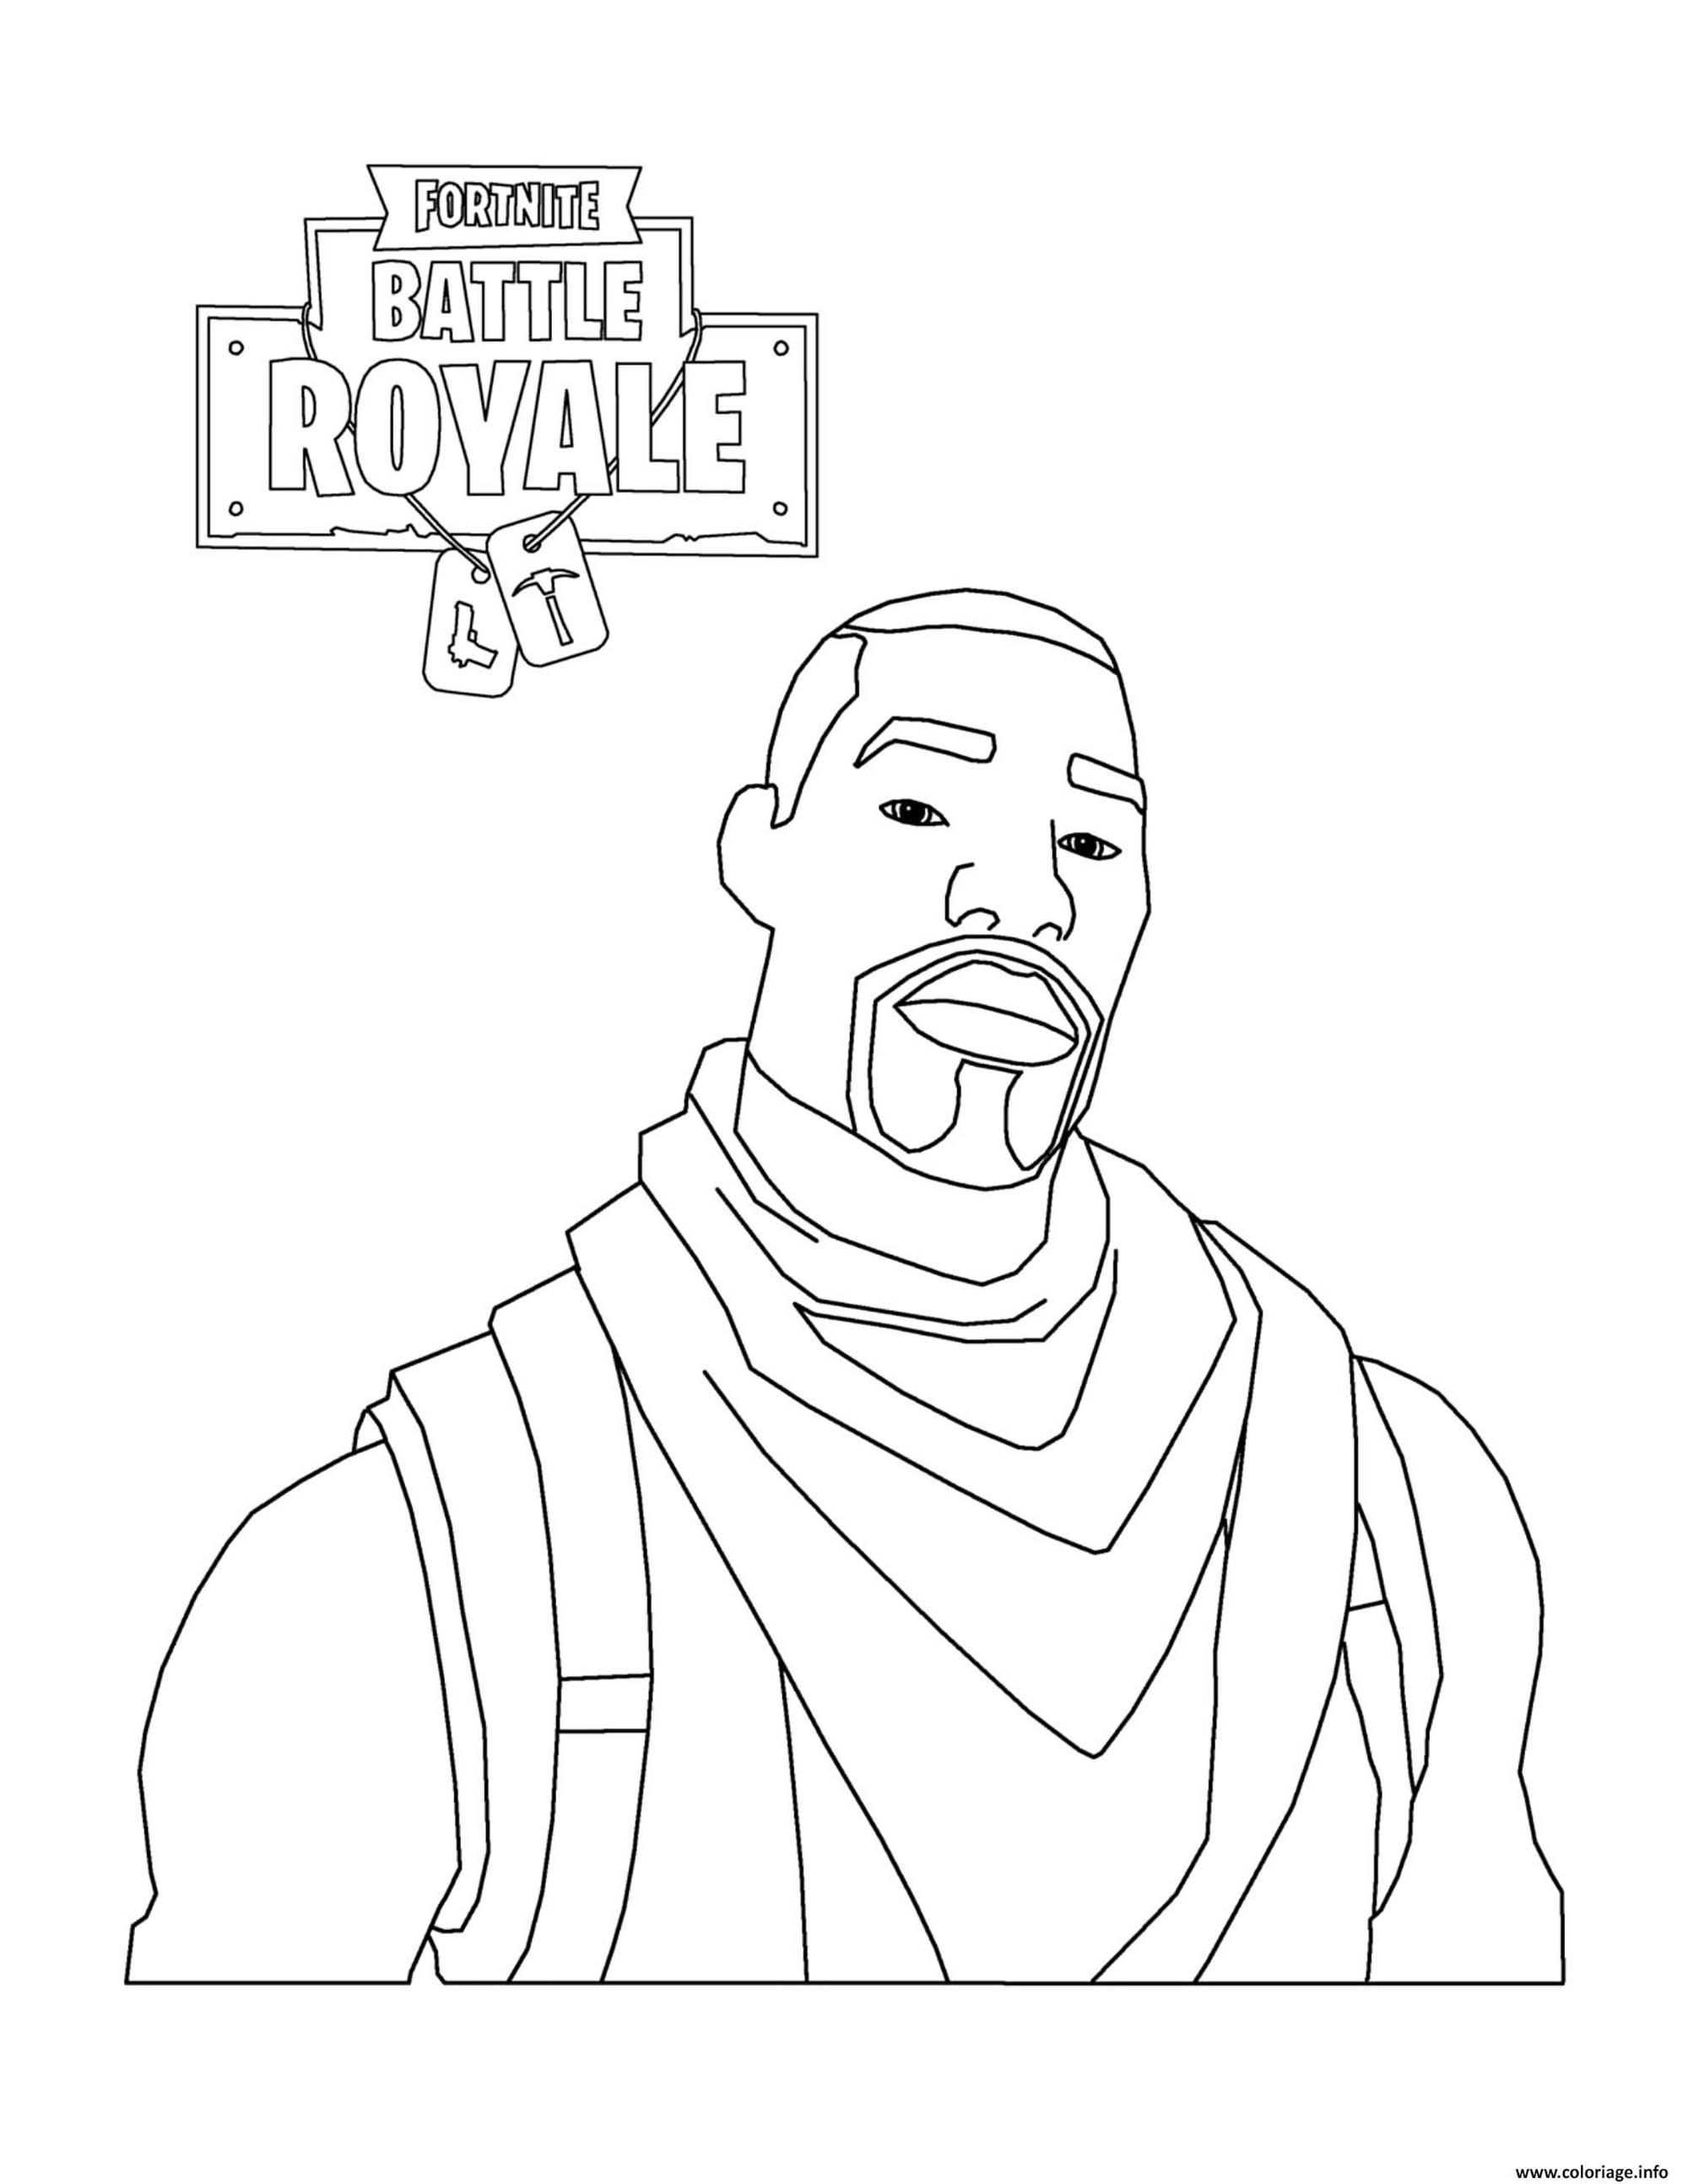 Fortnite Battle Royale Free Skin Fortnite Battle Royale